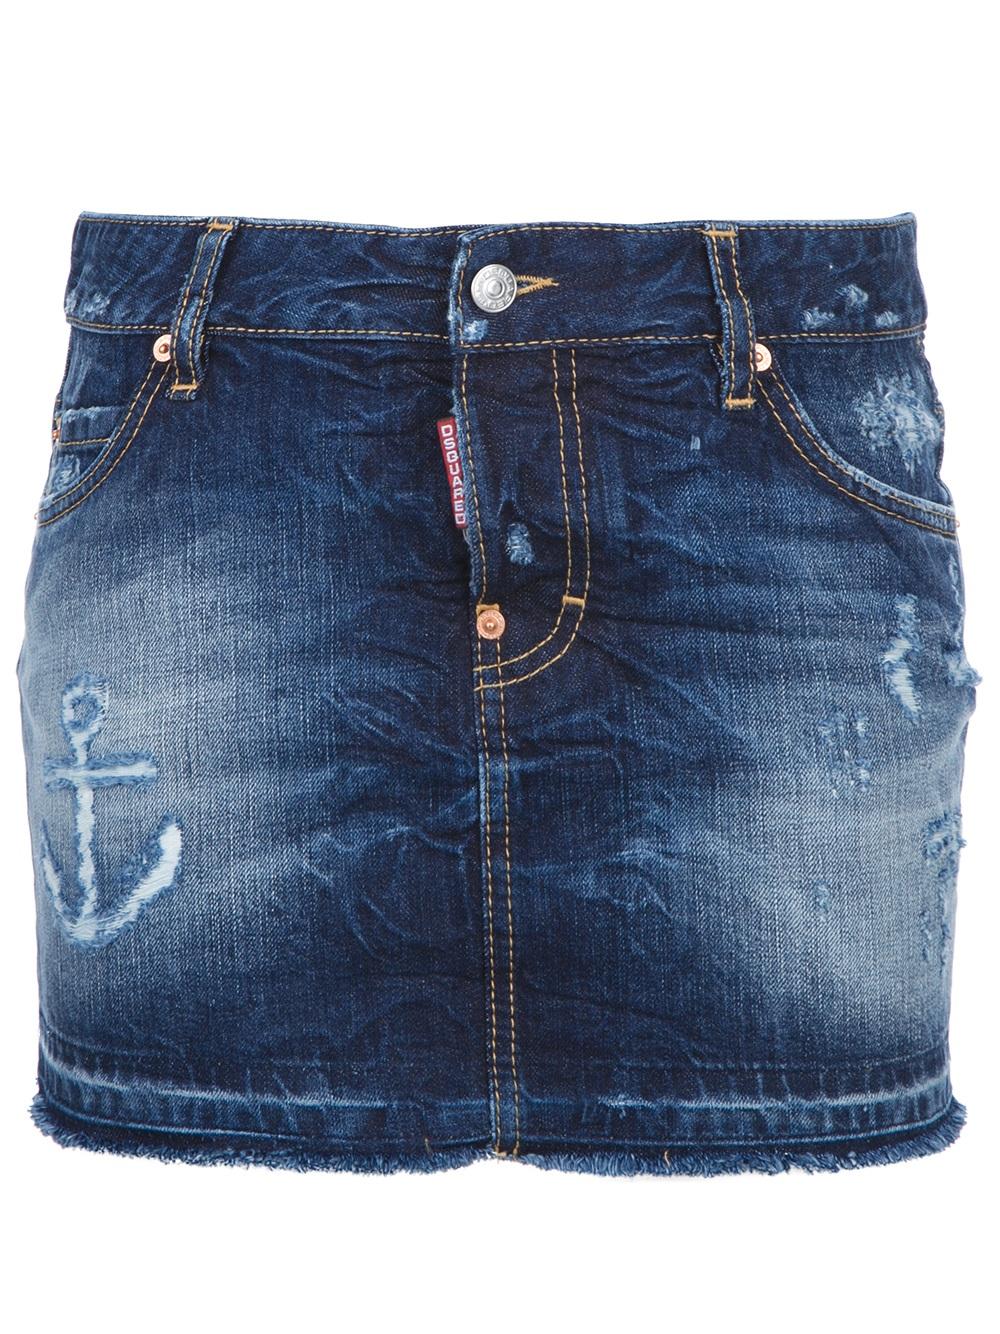 dsquared2 denim mini skirt in blue denim lyst